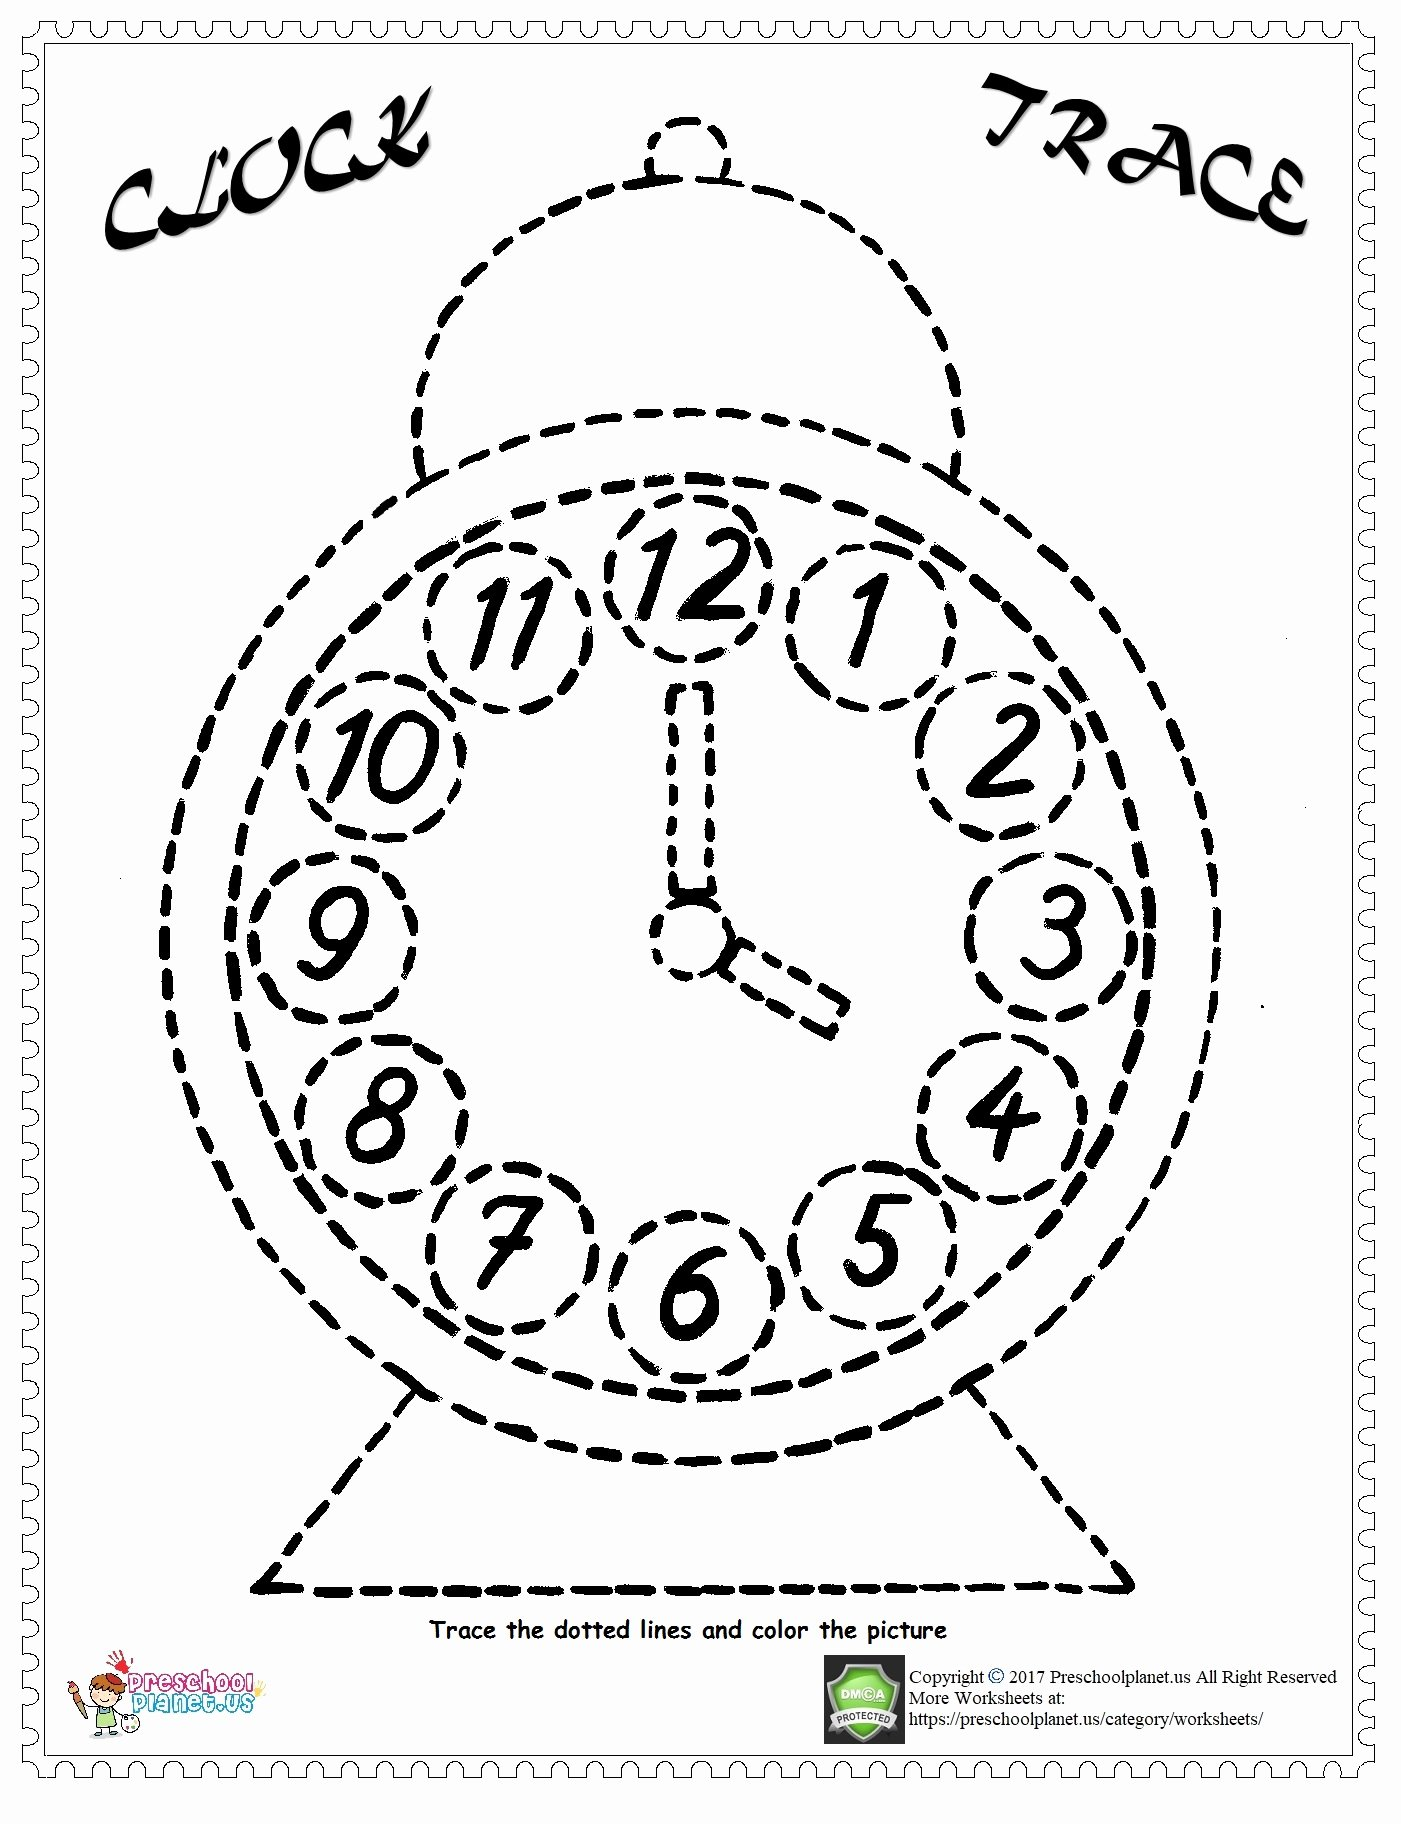 Planet Worksheets for Preschoolers Best Of Worksheets Clock Trace Line Worksheet Preschoolplanet